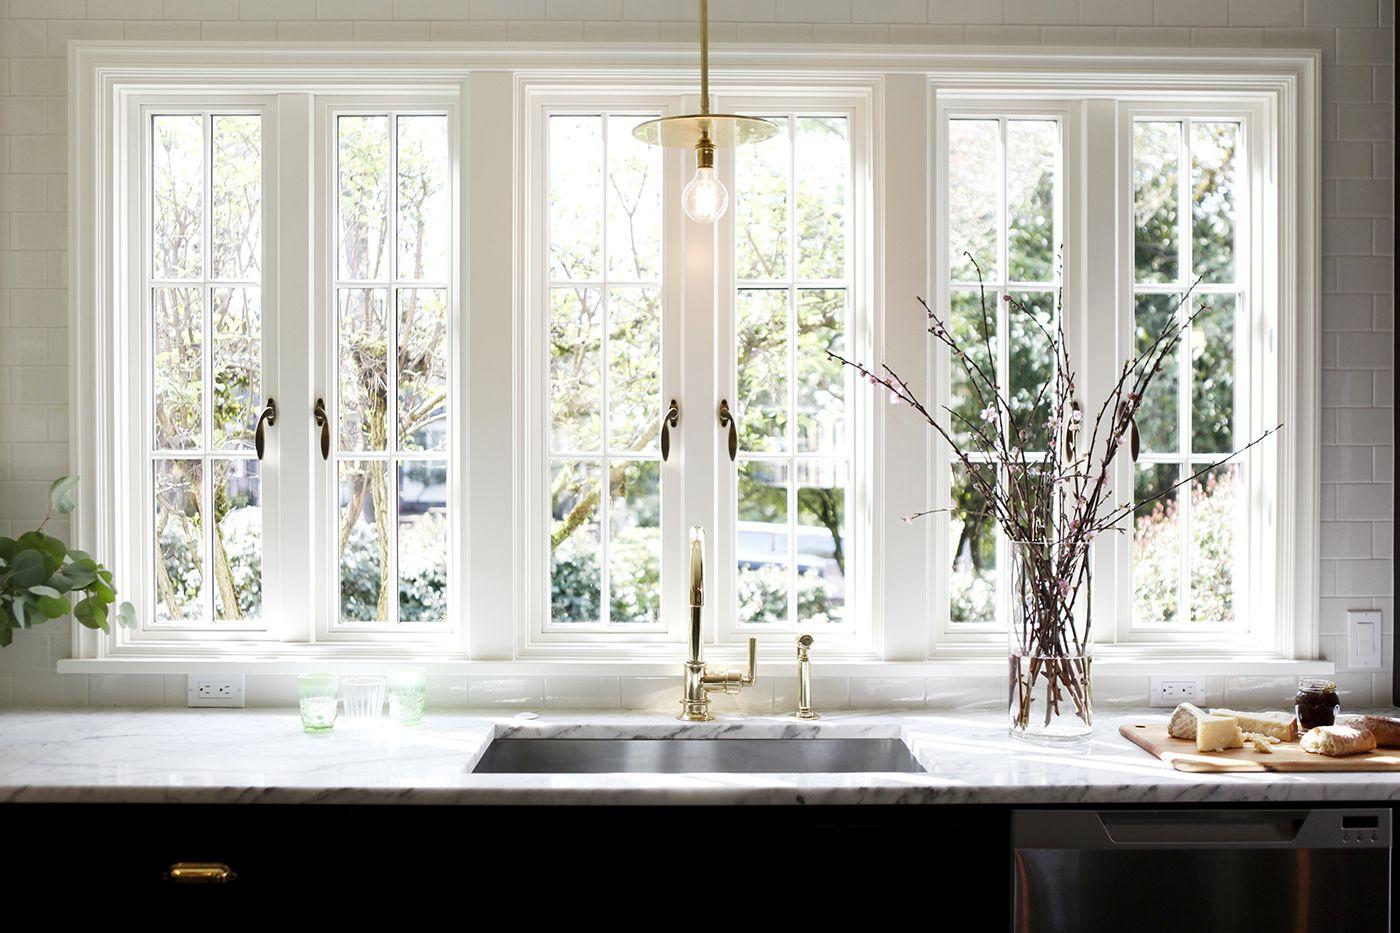 Timeless Cottage H2 Design Build Kitchen Sink Window Cottage Kitchen Design Modern Cottage